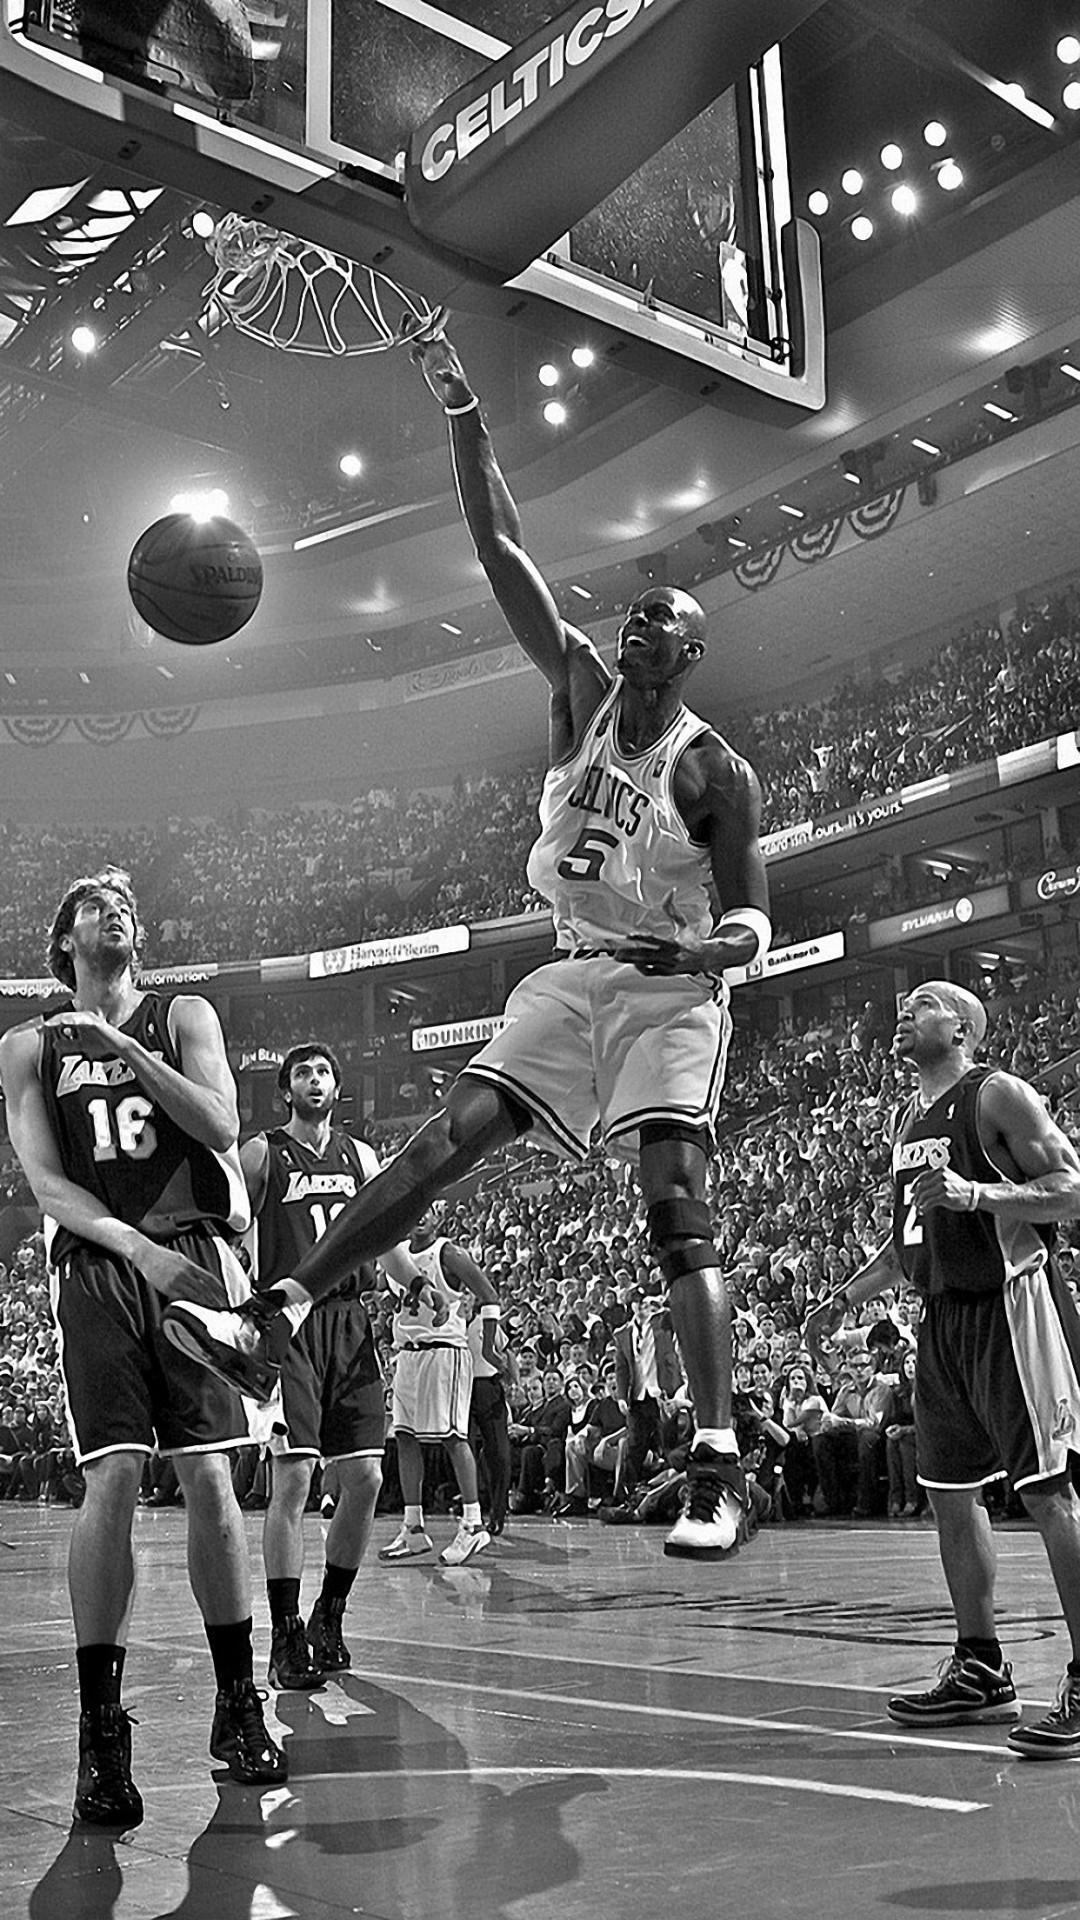 Duke Basketball Iphone Wallpaper 55 Images